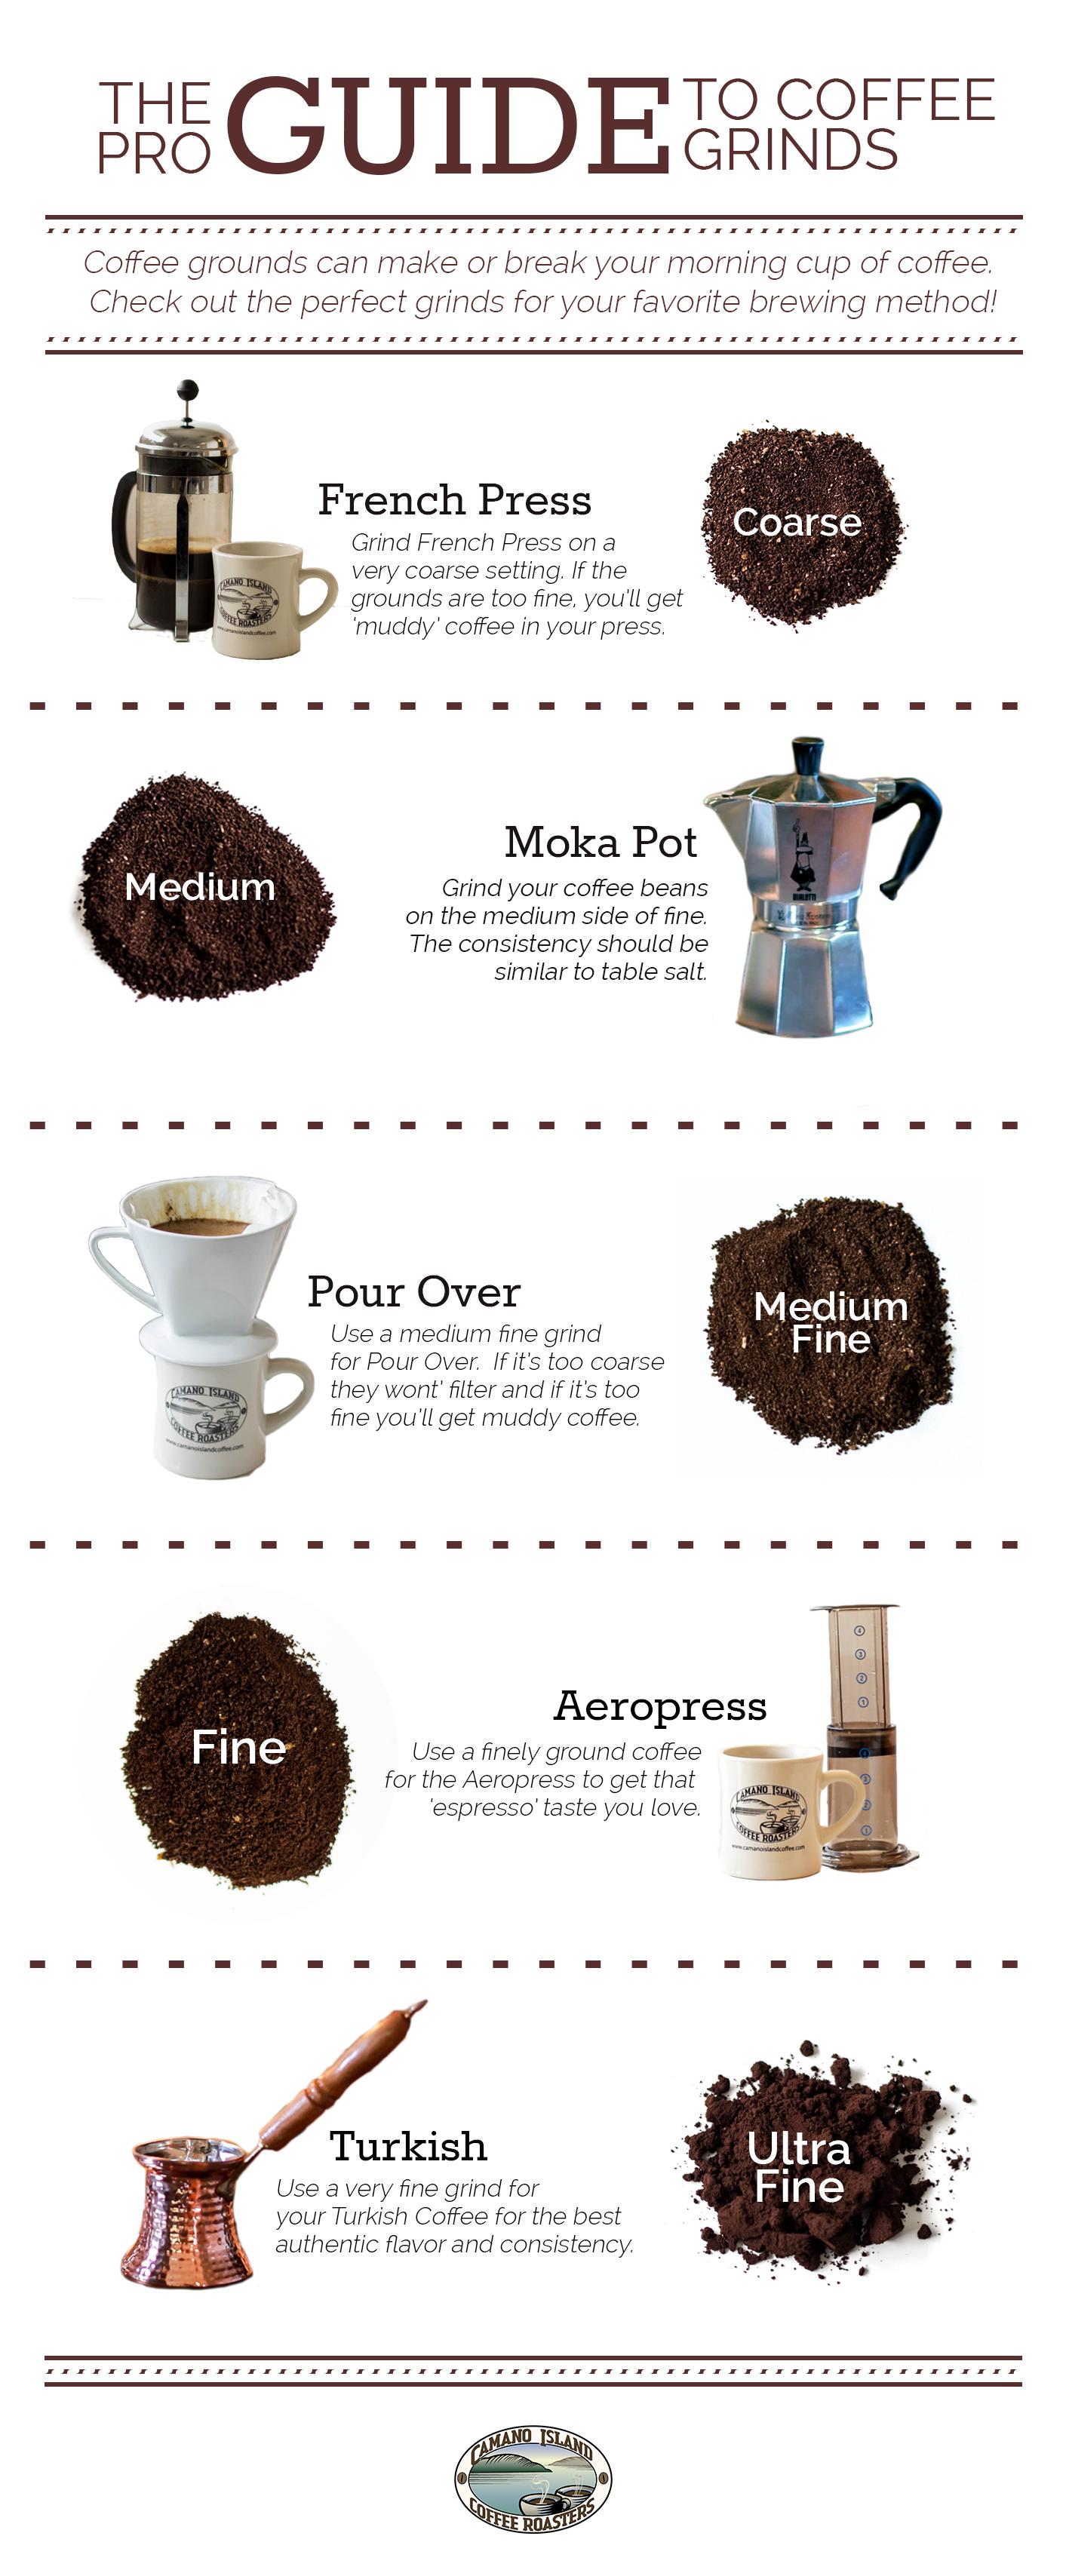 Guide to Coffee Grinds CoffeeEquipment Coffee grinds